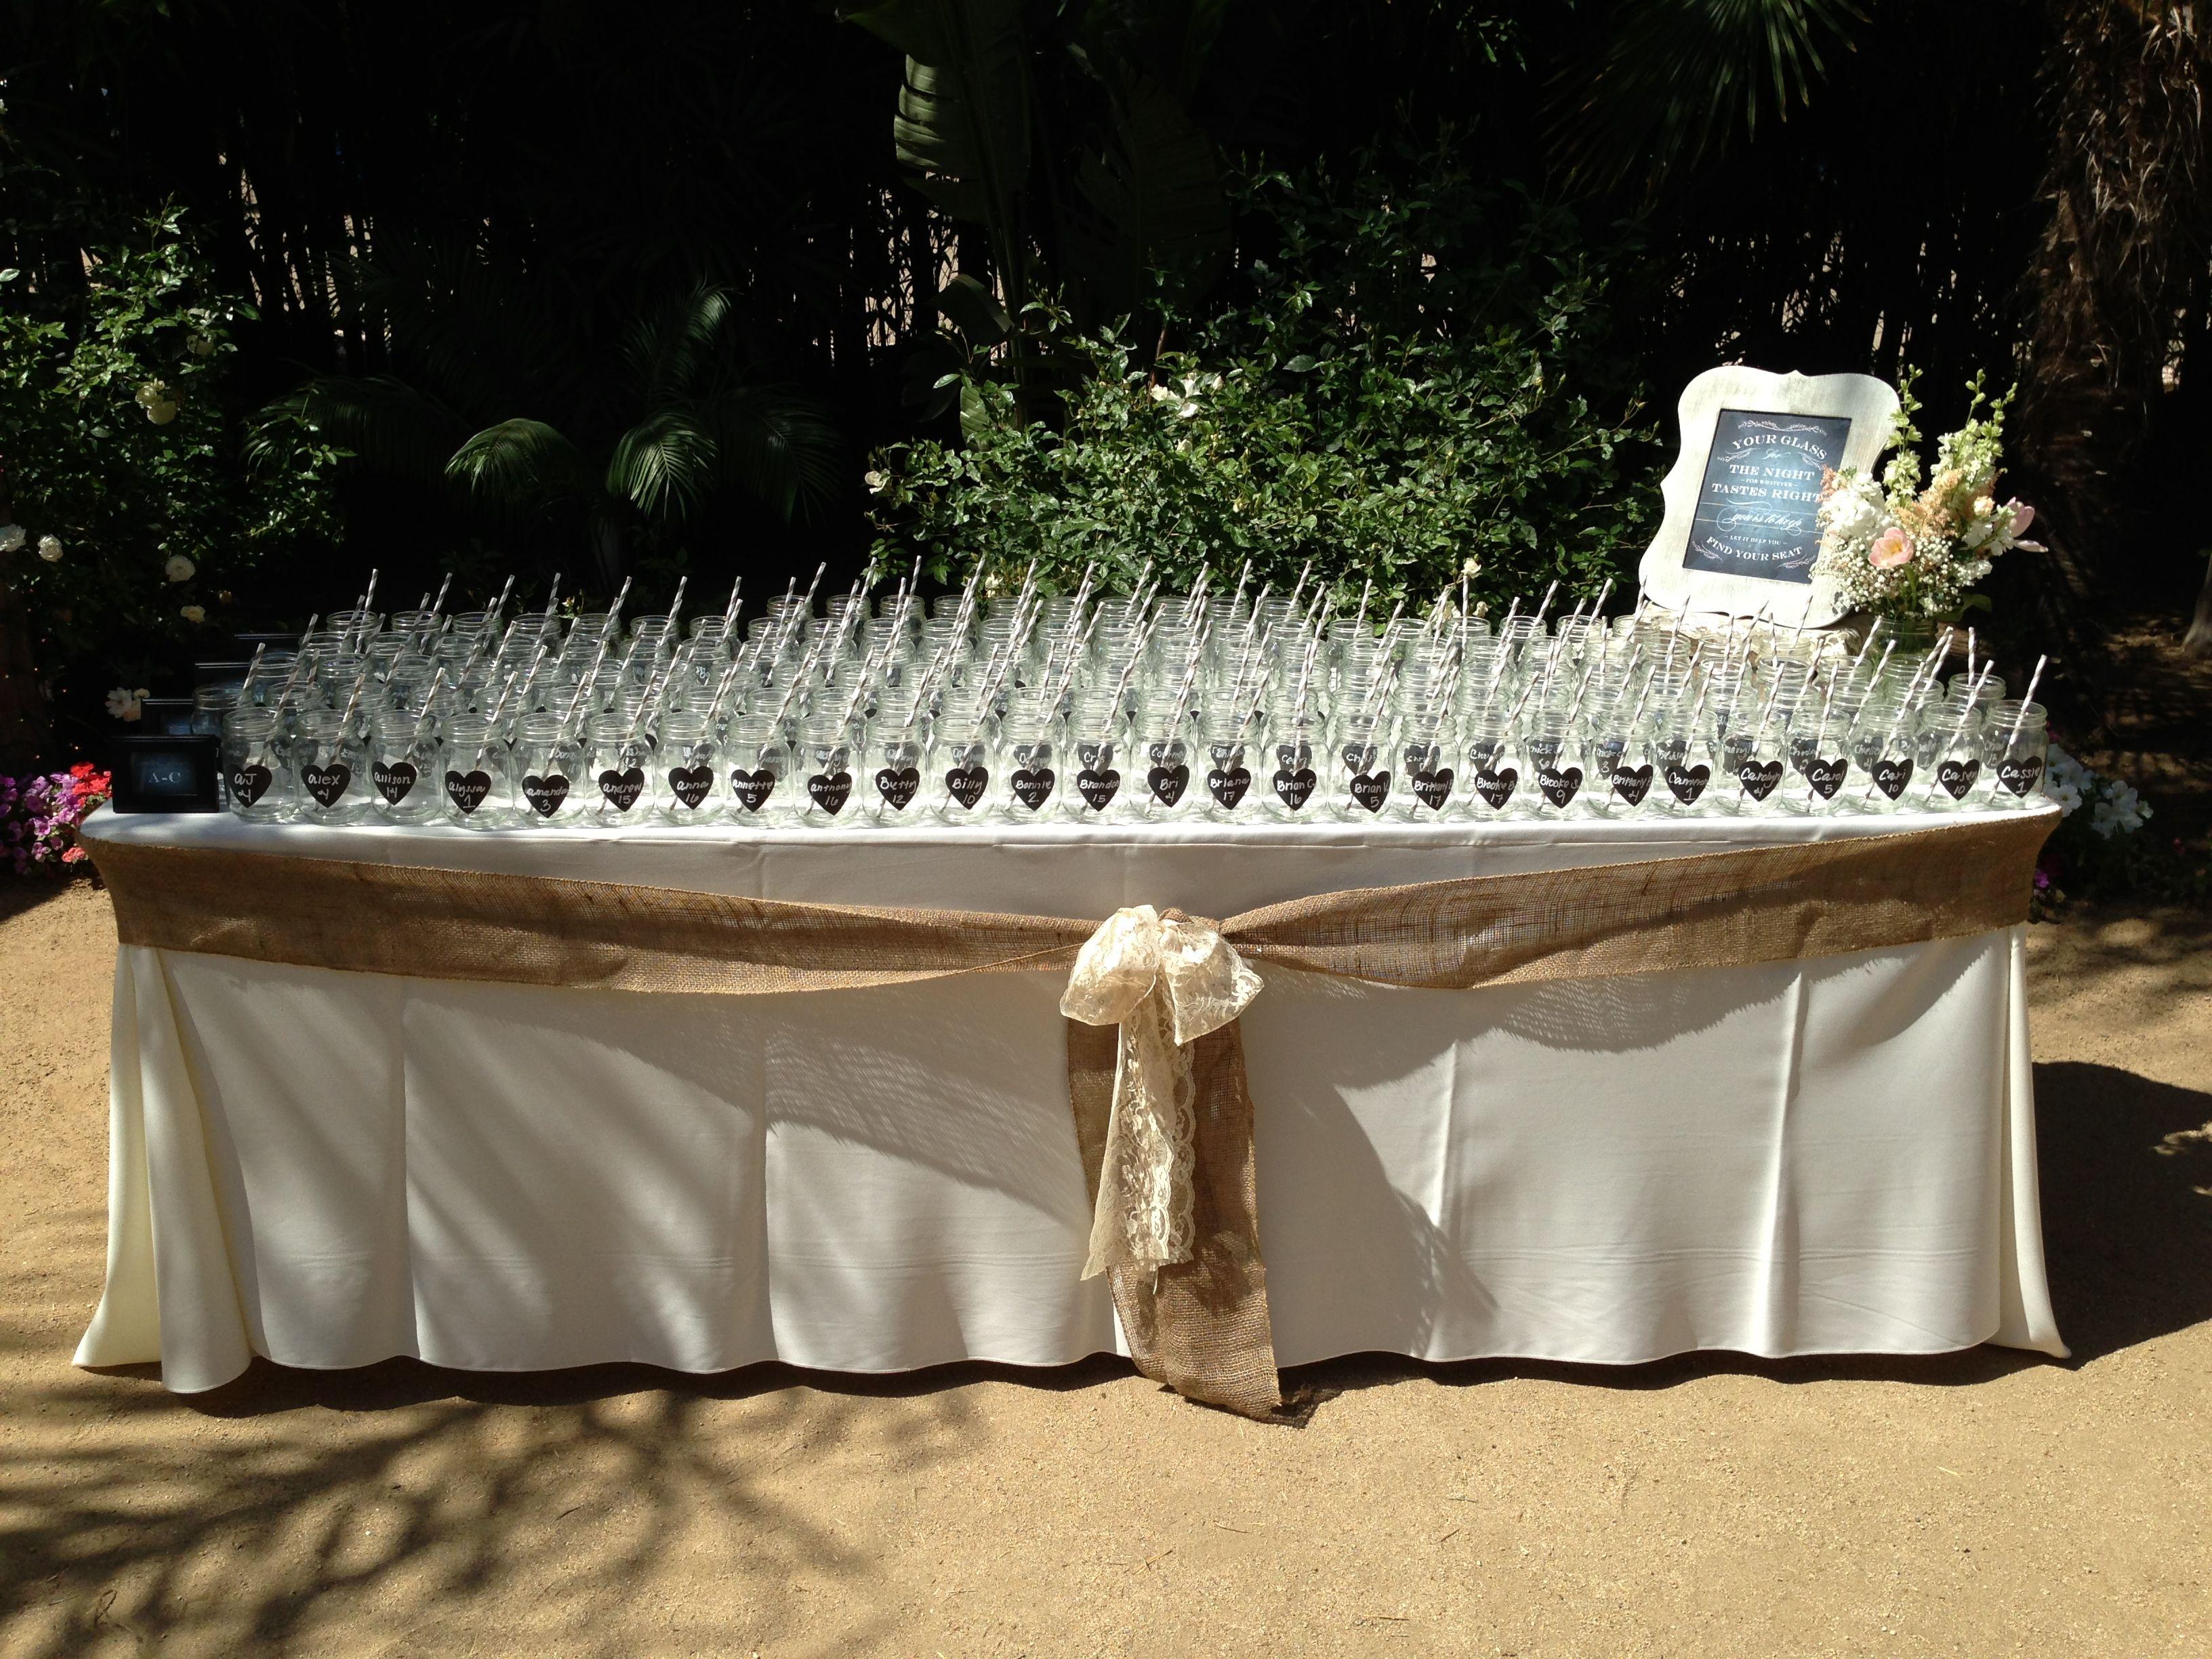 Rustic Wedding Seating Chart Ideas: Rustic Shabby Chic Wedding Seating Chart Mason Jars